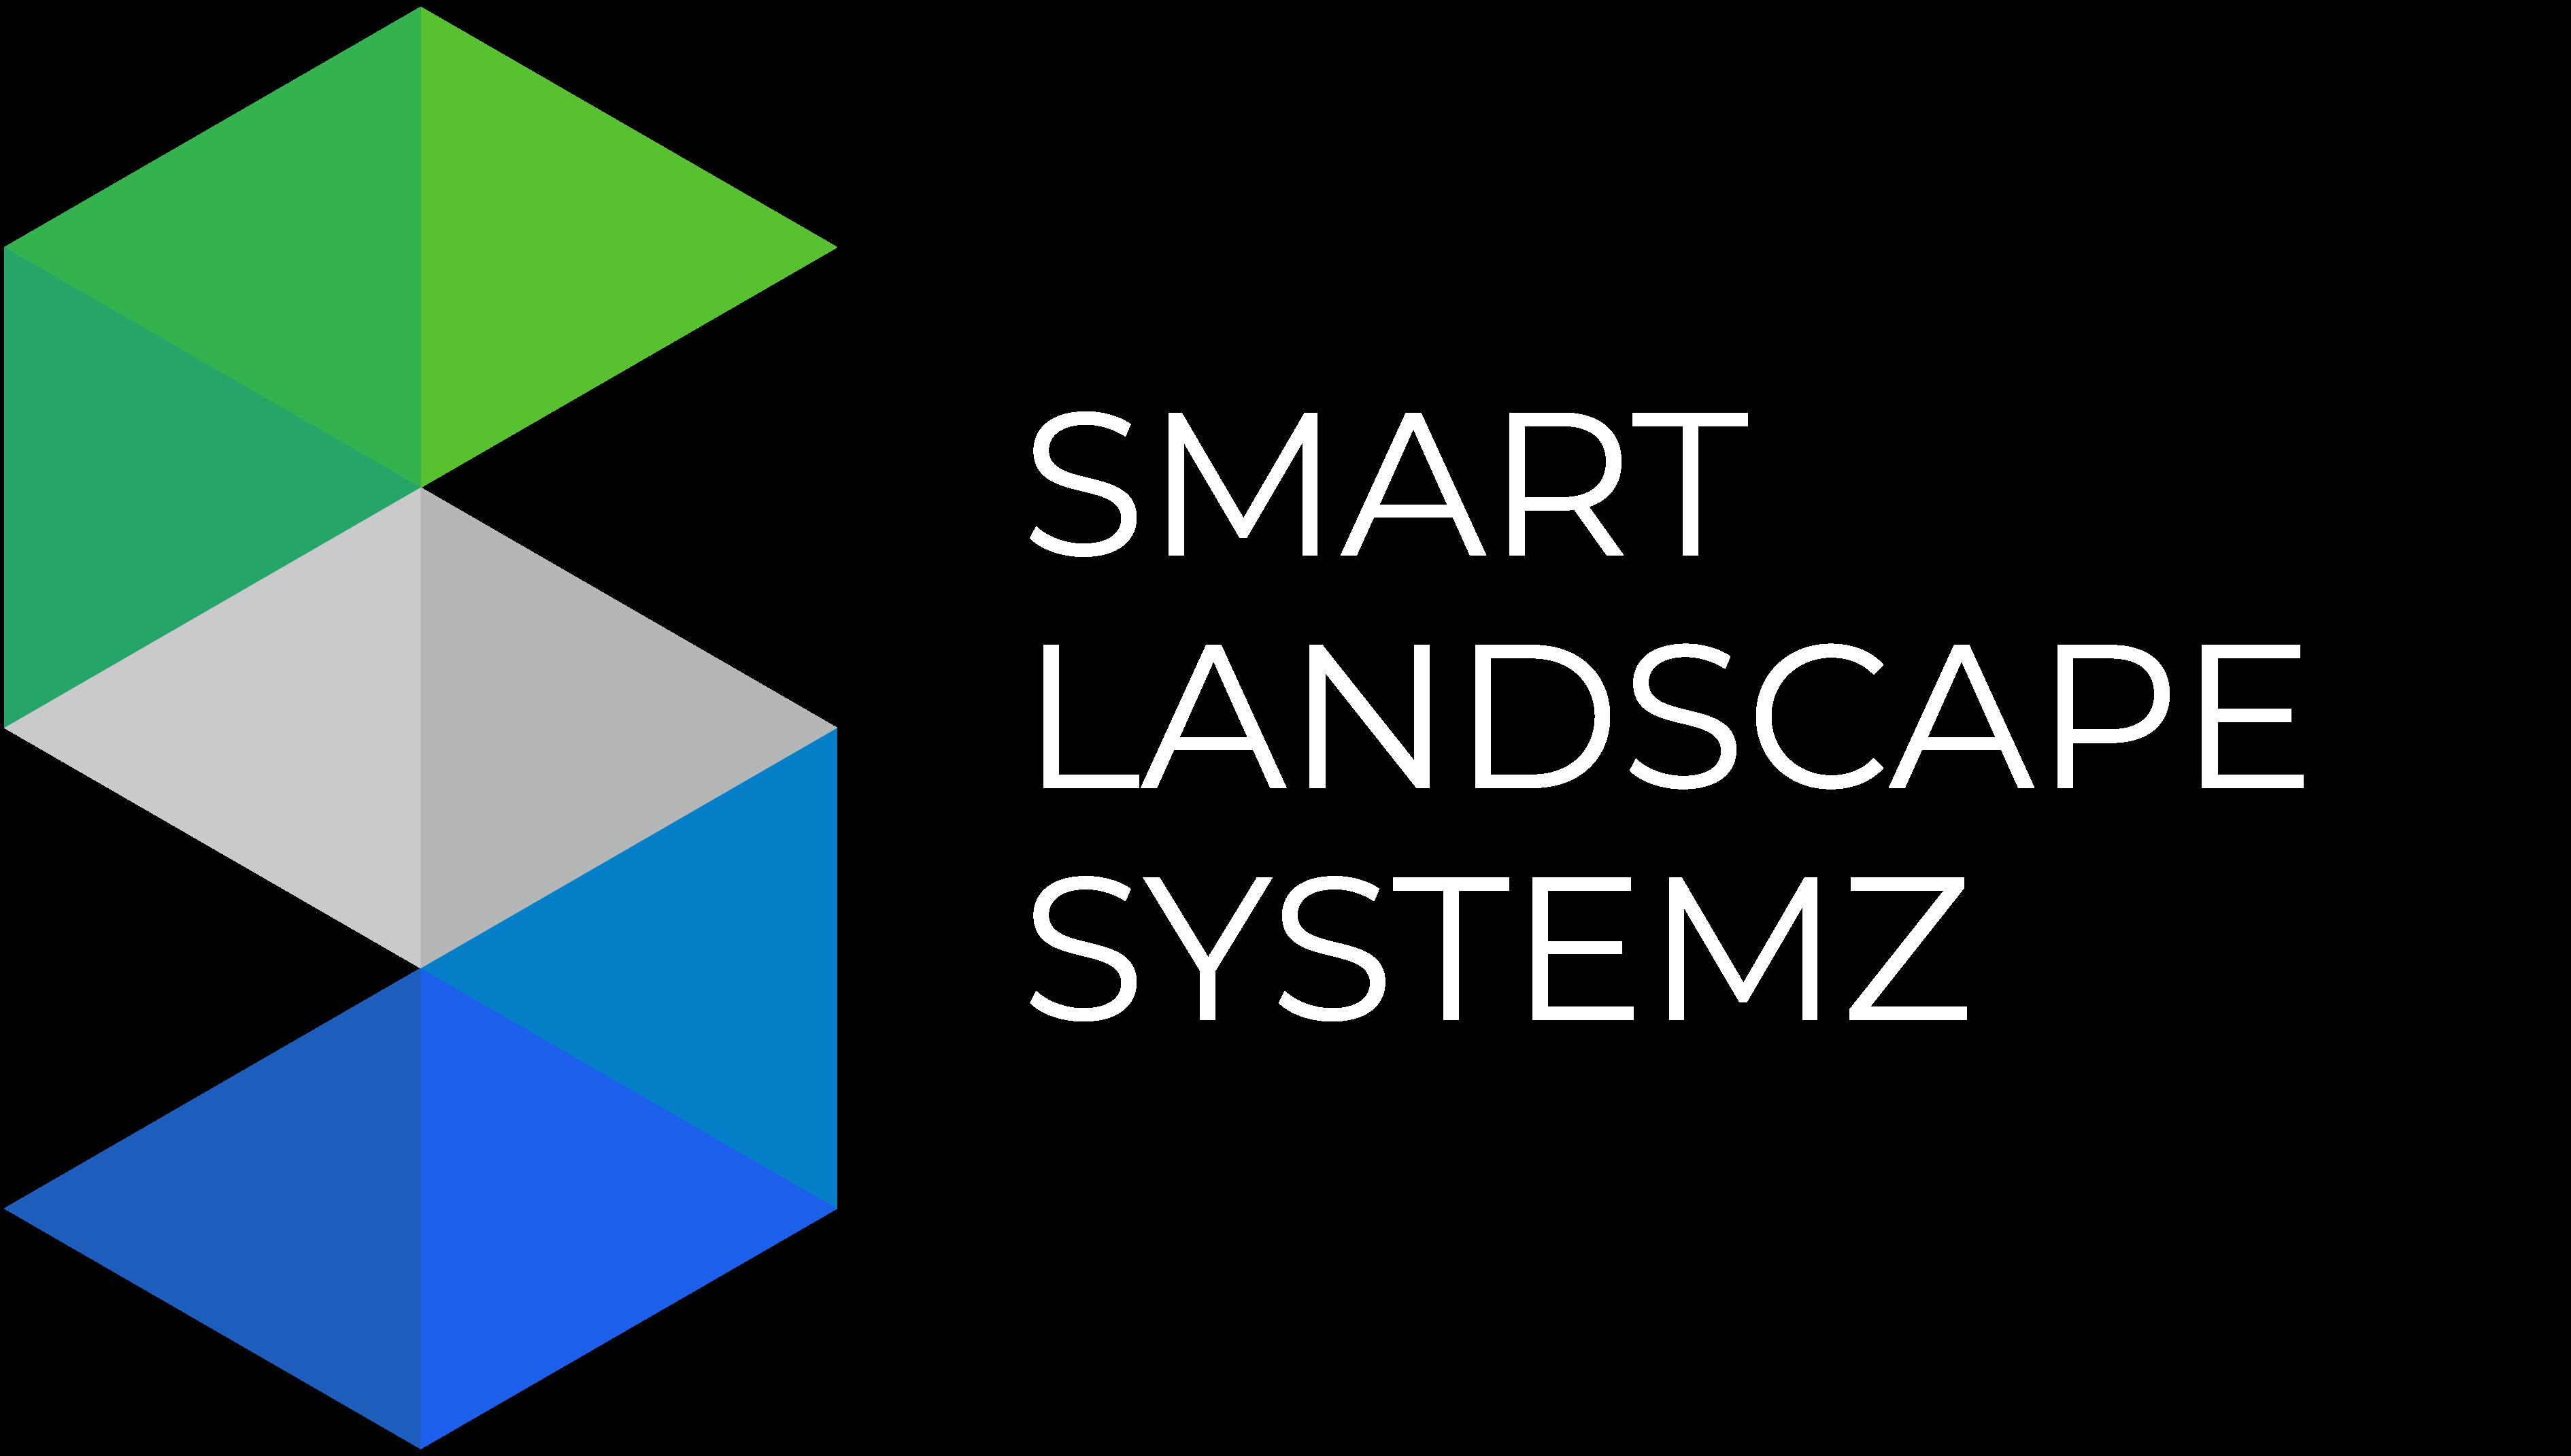 Smart Landscape SystemZ